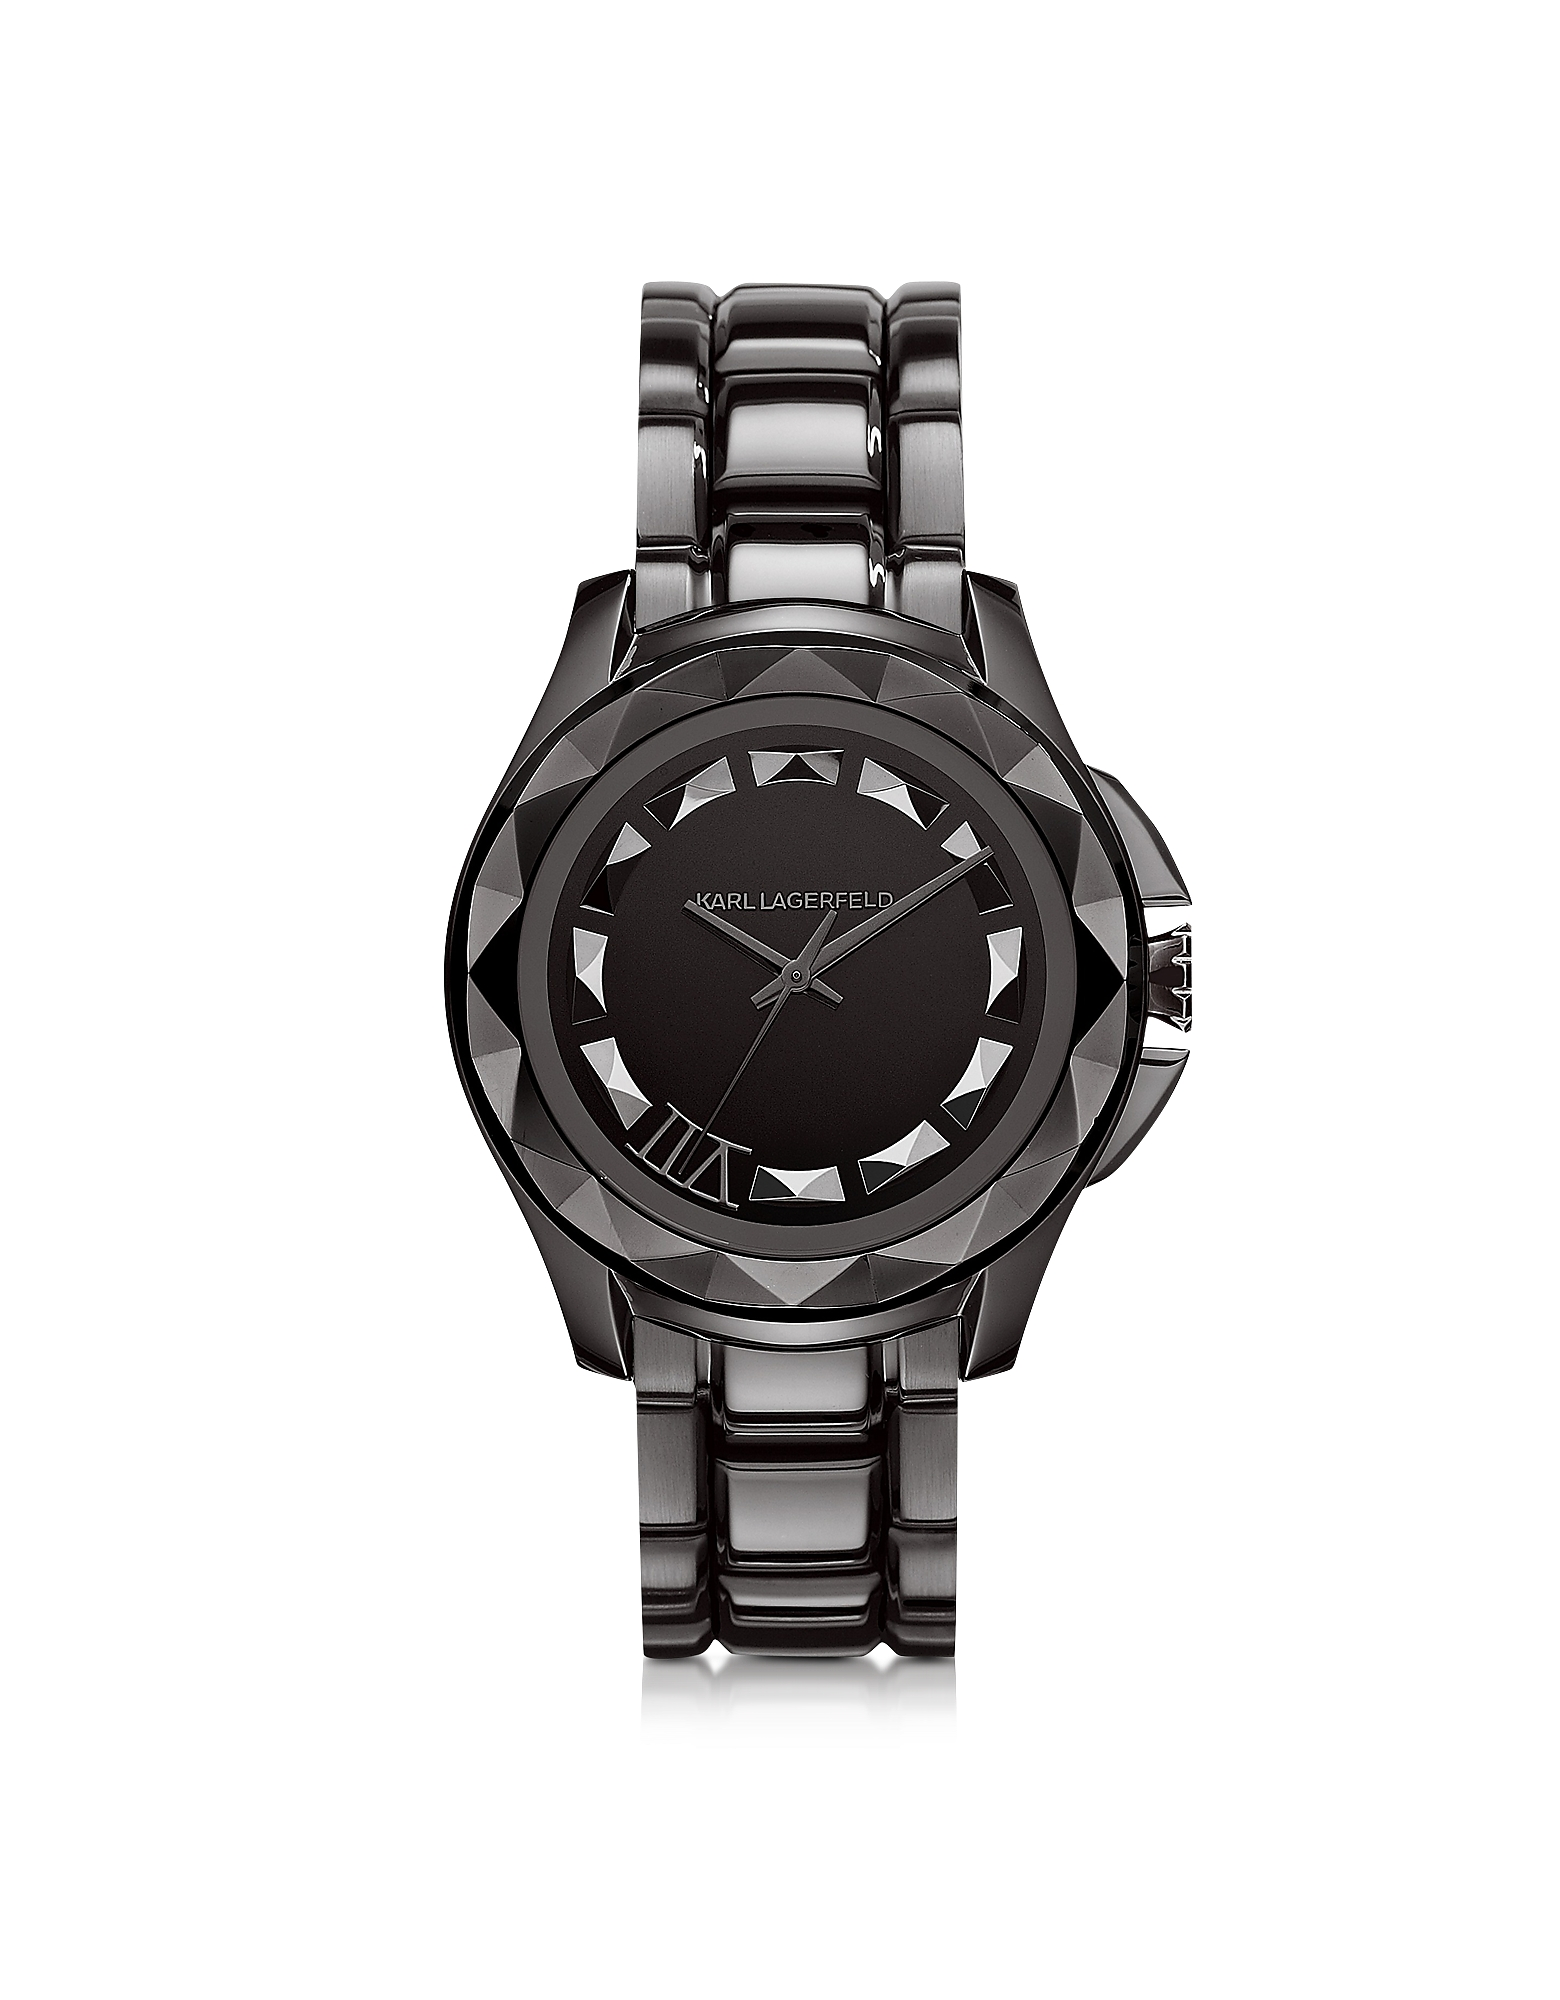 Karl Lagerfeld Karl 7 - 43.5 мм Хромовые Часы Унисекс из Нержавеющей Стали